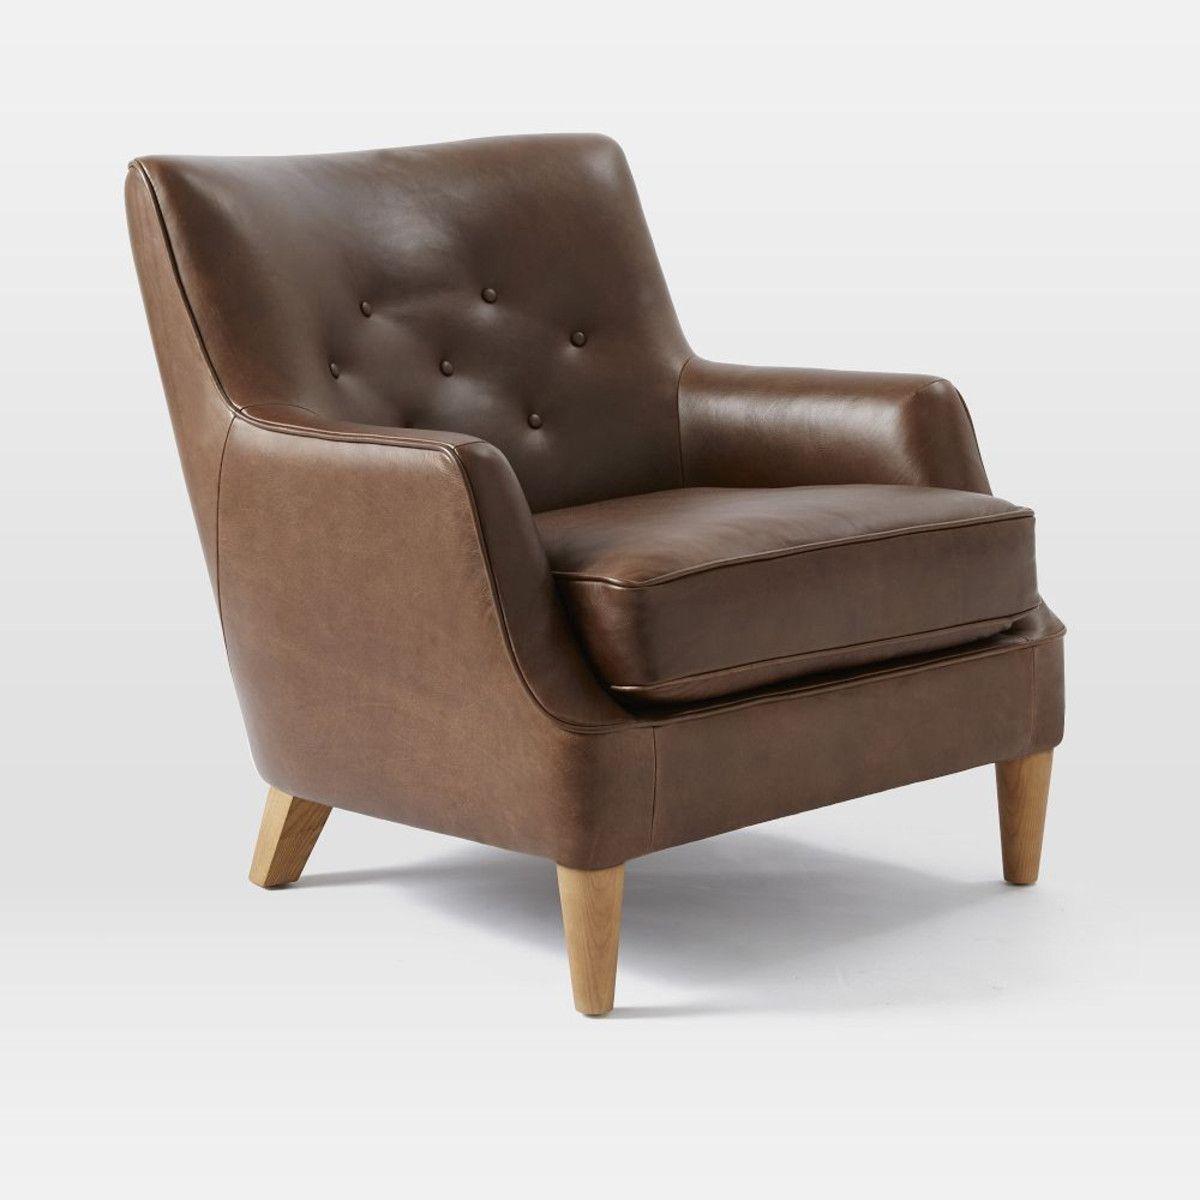 Livingston Leather Club Chair - Clove